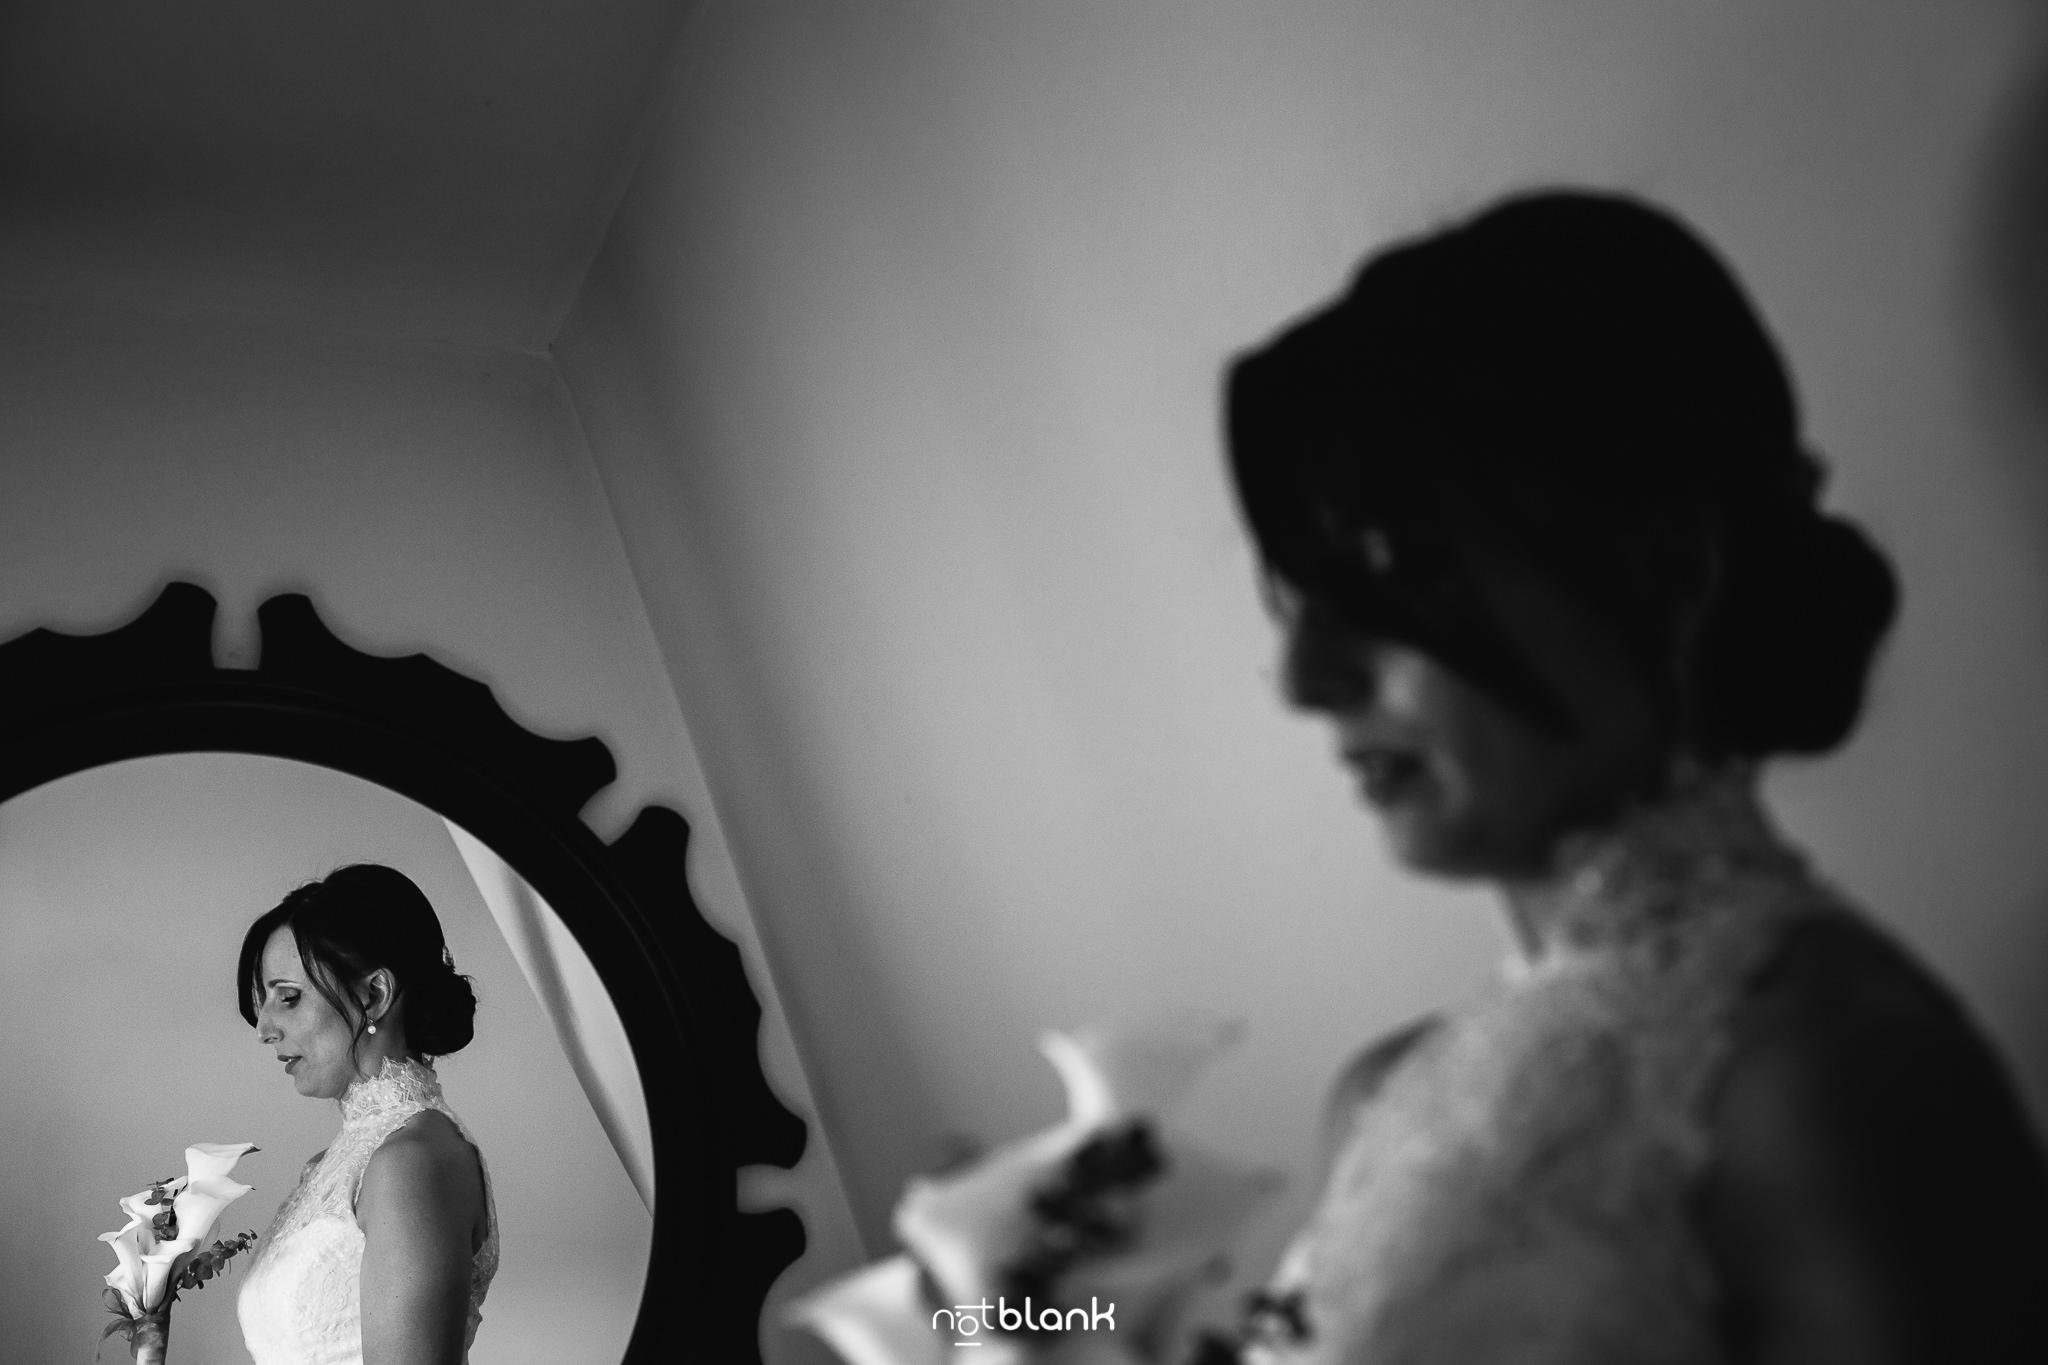 Boda-Maite-David-Preparativos-Novia-En-Casa-Retrato-Novia. Reportaje realizado por Notblank fotógrafos de boda